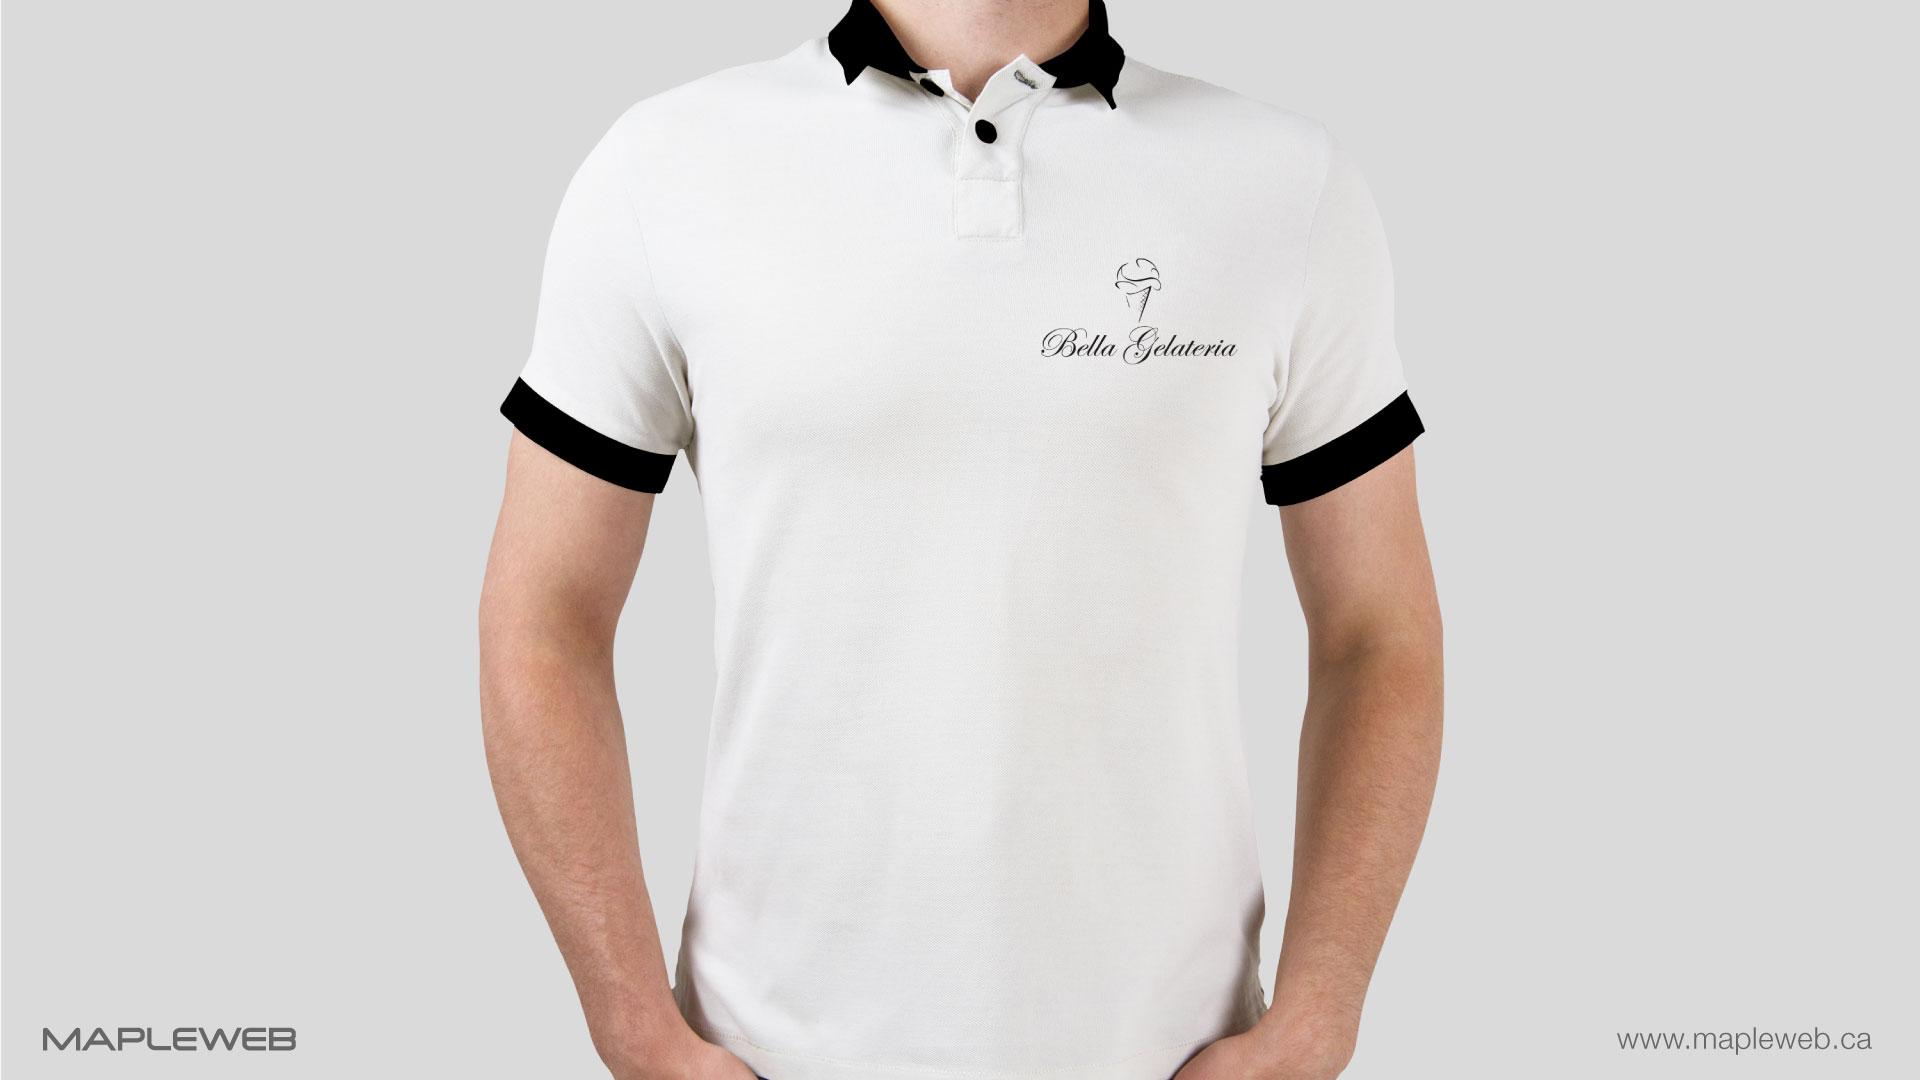 bella-gelateria-brand-logo-design-by-mapleweb-vancouver-canada-black-t-shirt-mock